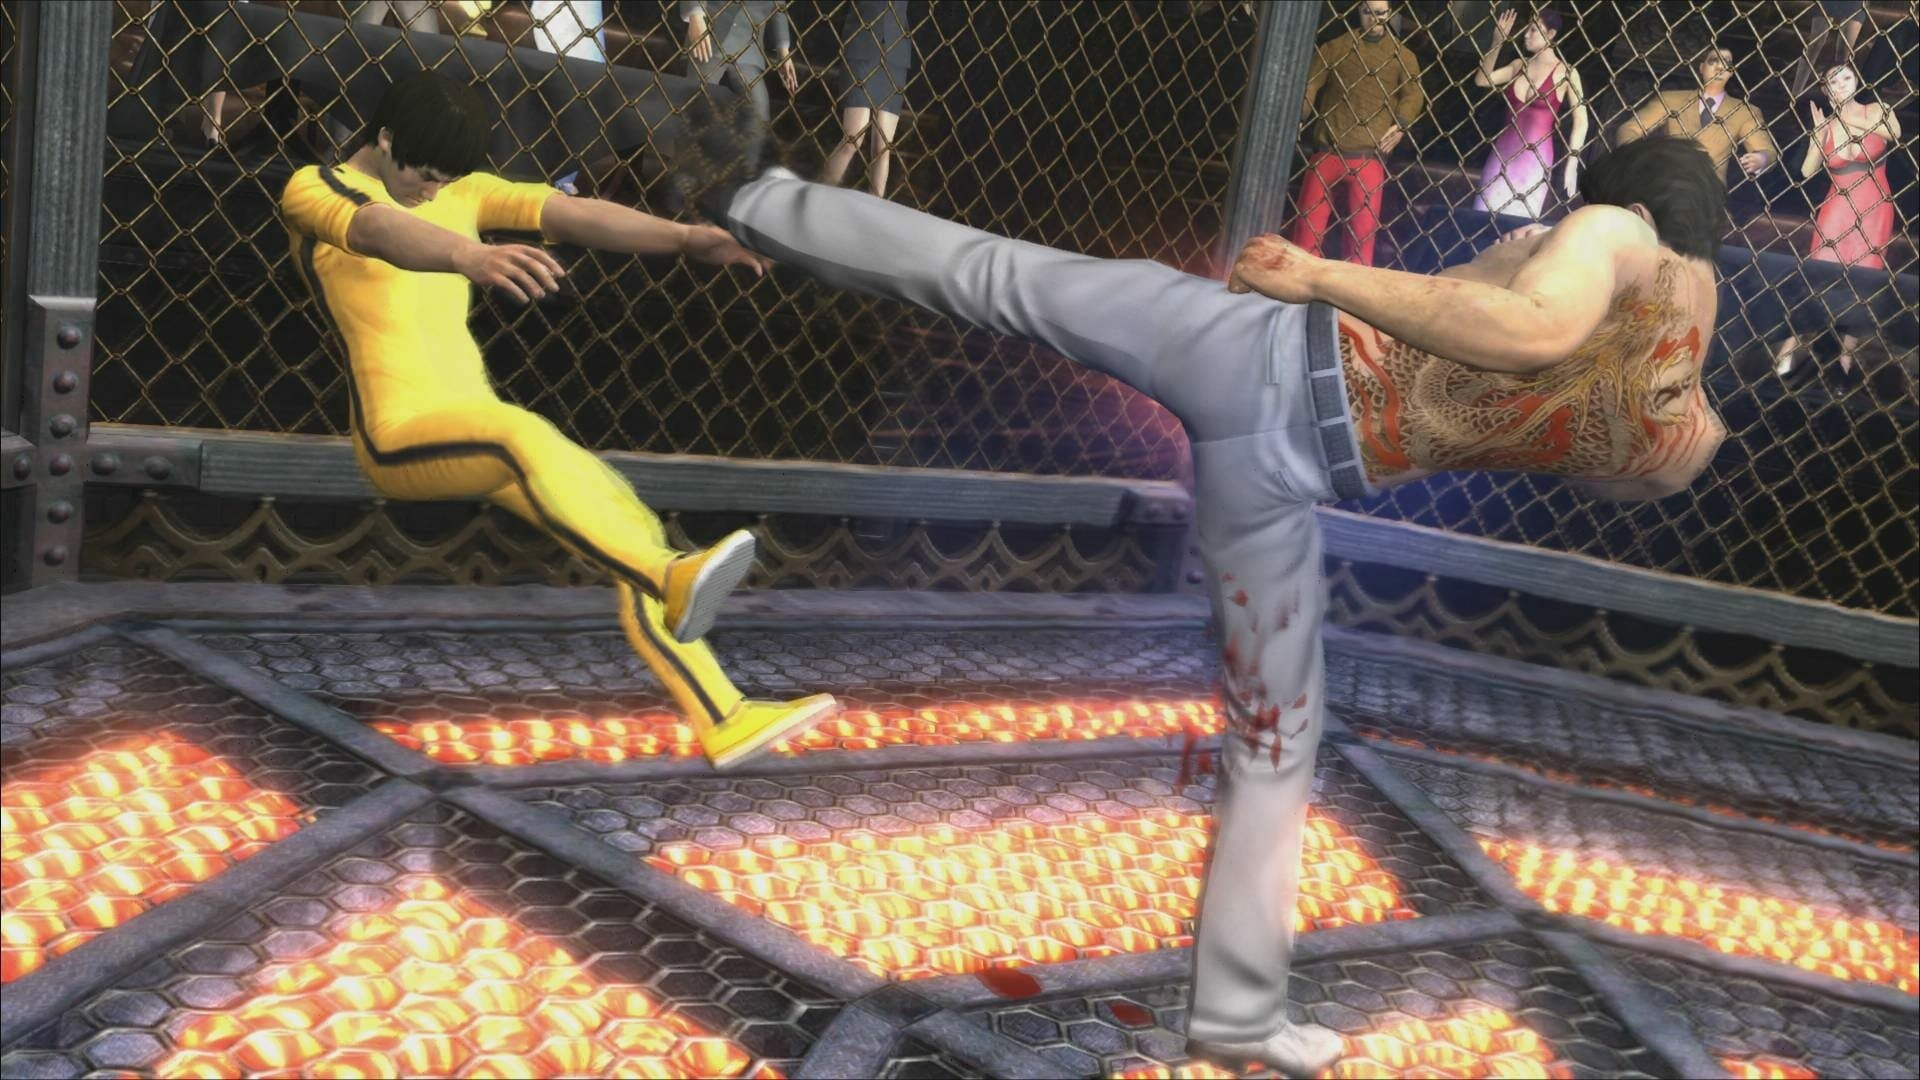 Yakuza 3 Remaster Screenshots Shows Cage Fighting With